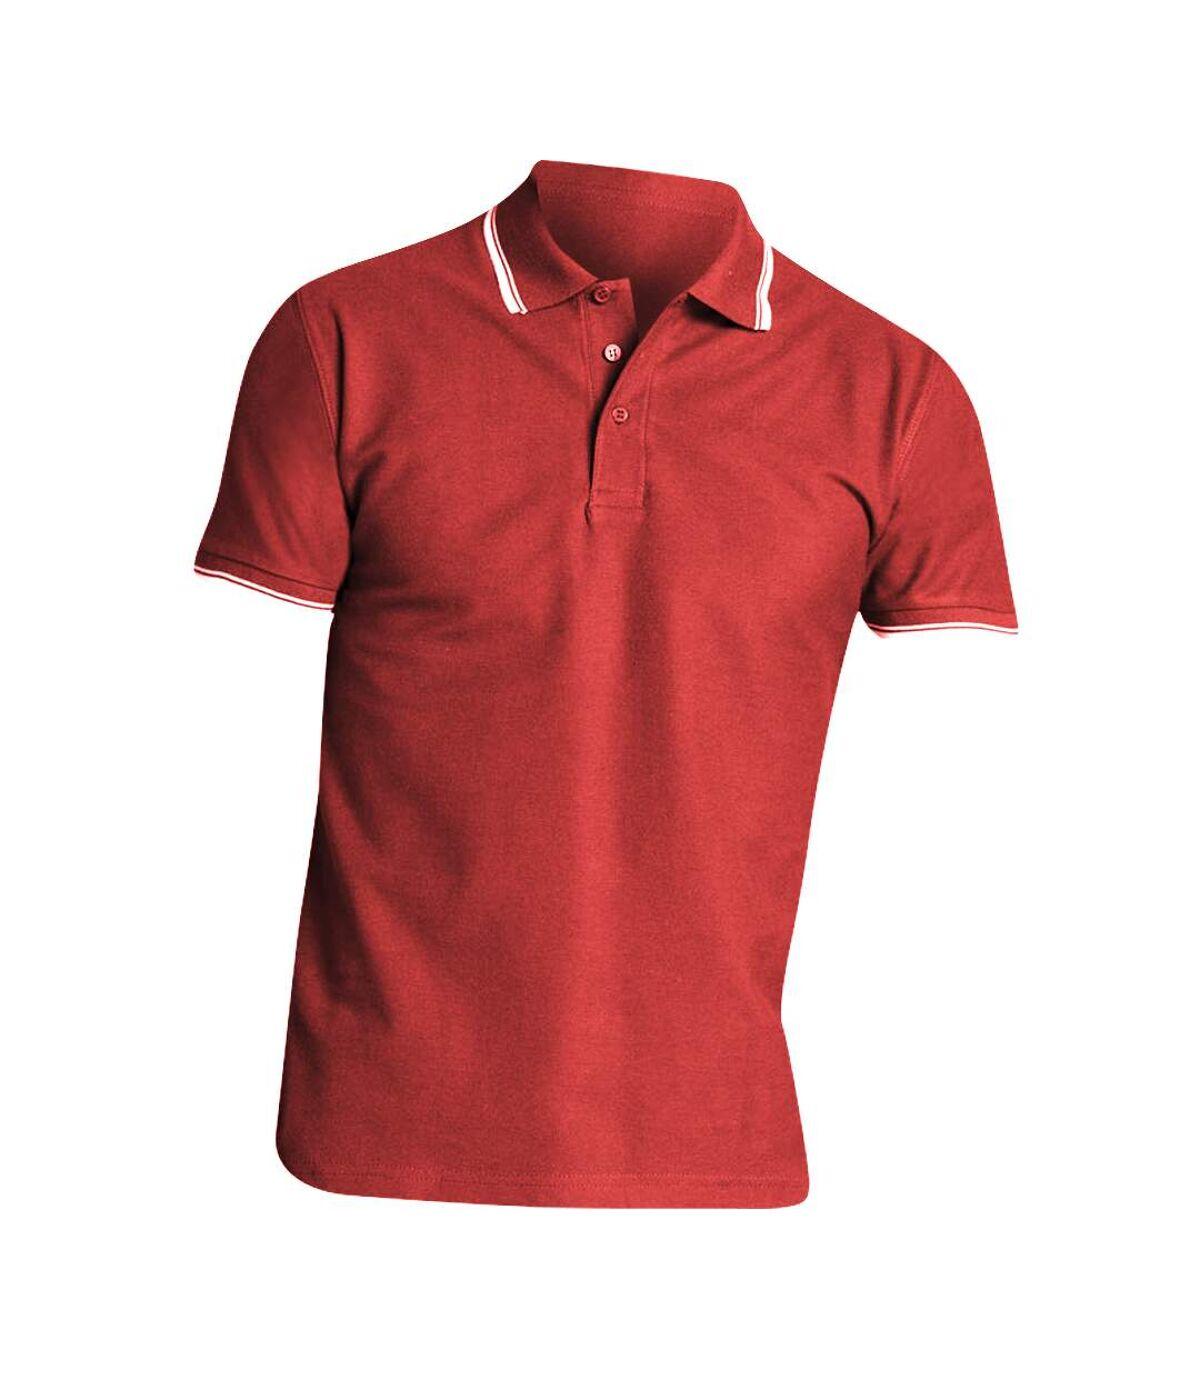 SOLS Mens Practice Tipped Pique Short Sleeve Polo Shirt (Black/White) - UTPC321